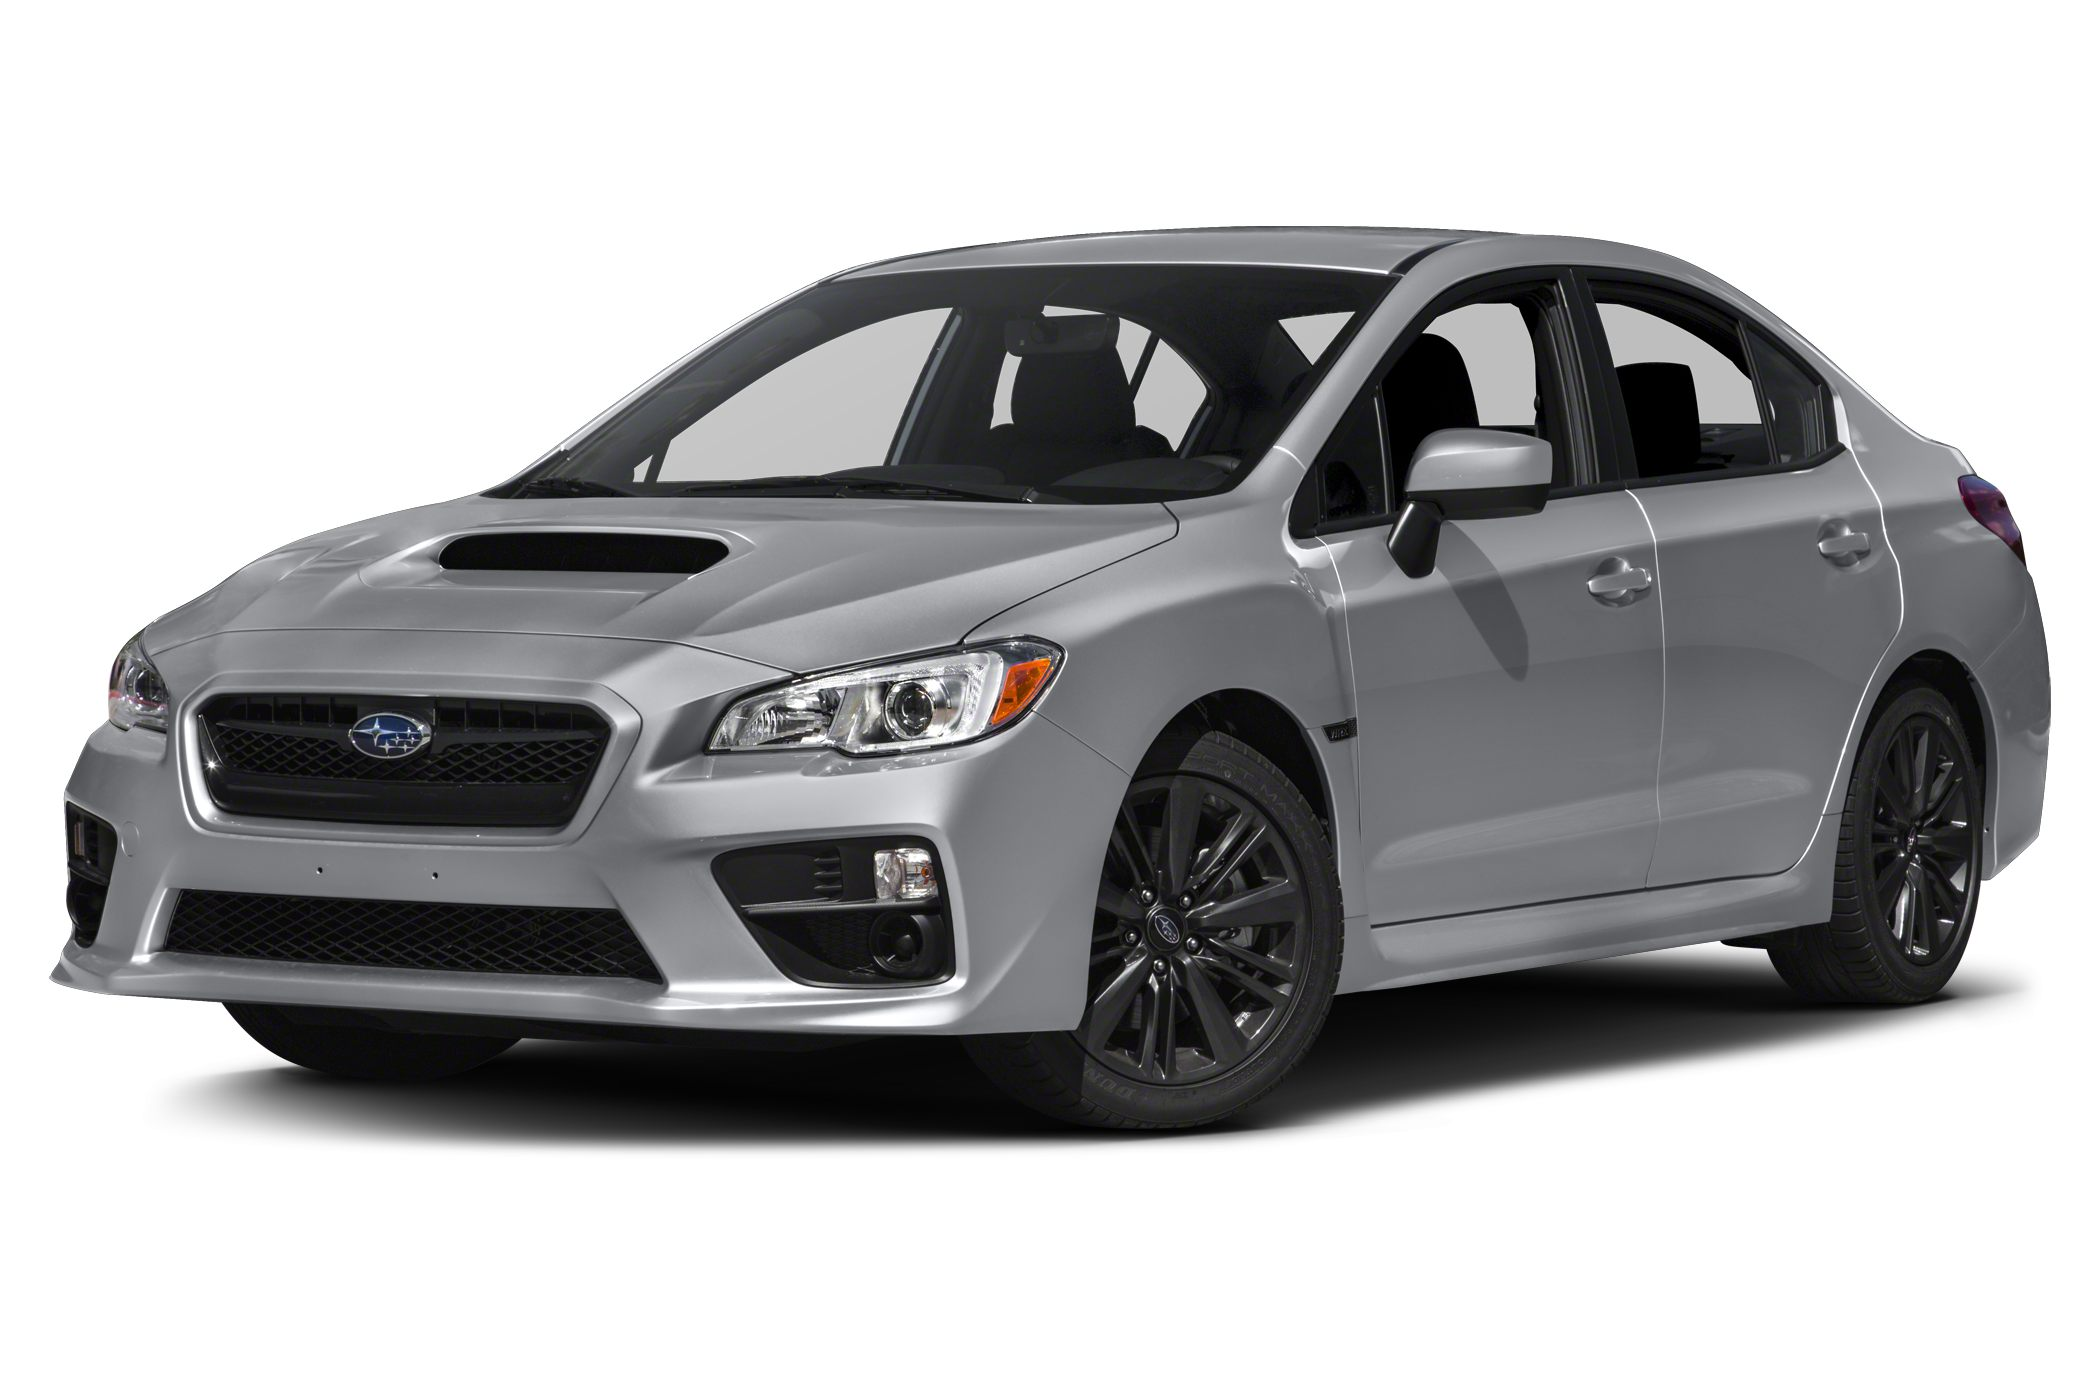 2016 Wrx New Car Test Drive 3 Reviews